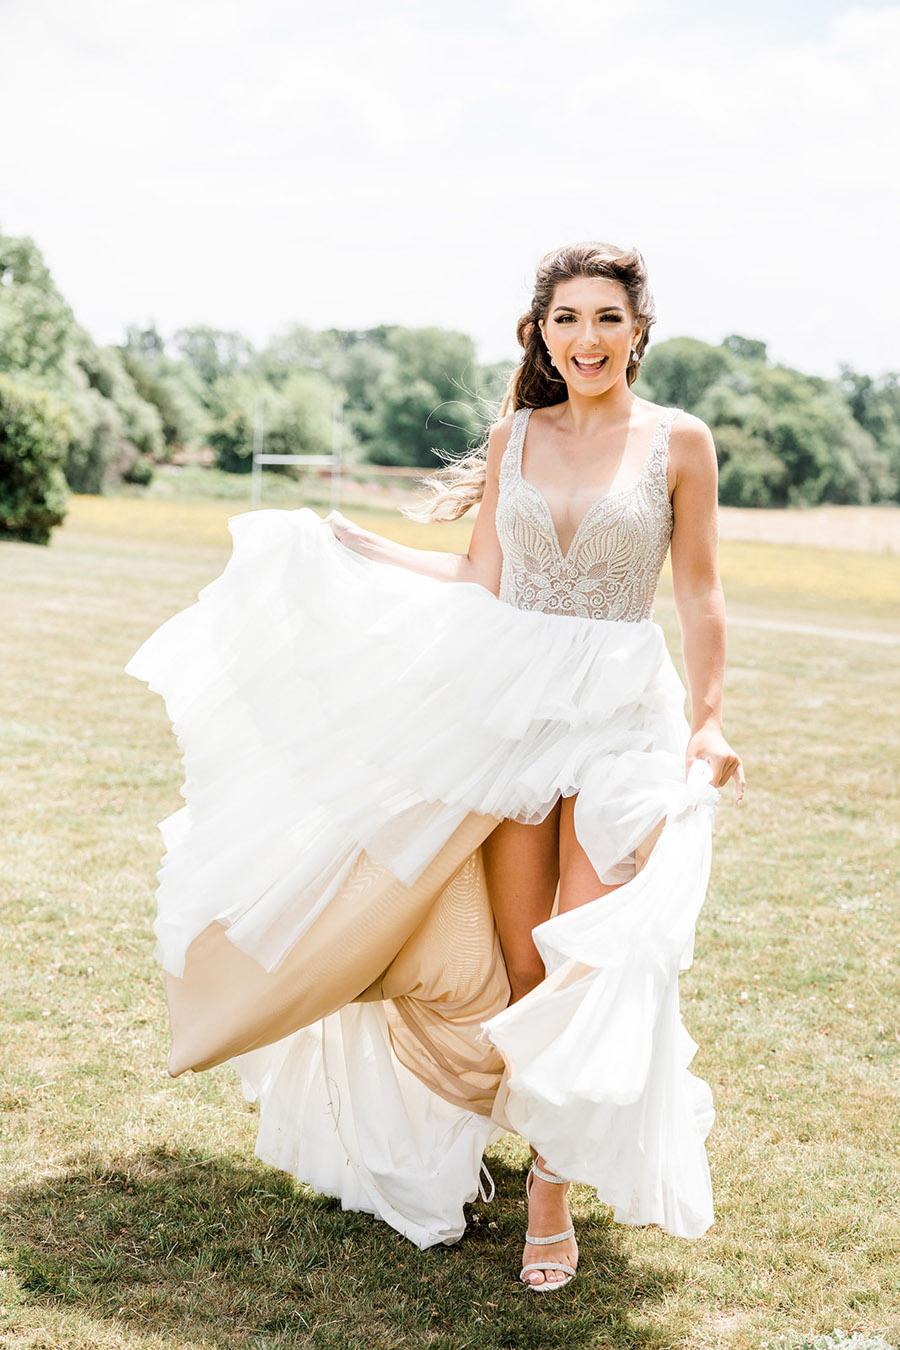 Modern Boho wedding style inspiration from Slindon House, photographer credit Kelsie Scully Photography (16)